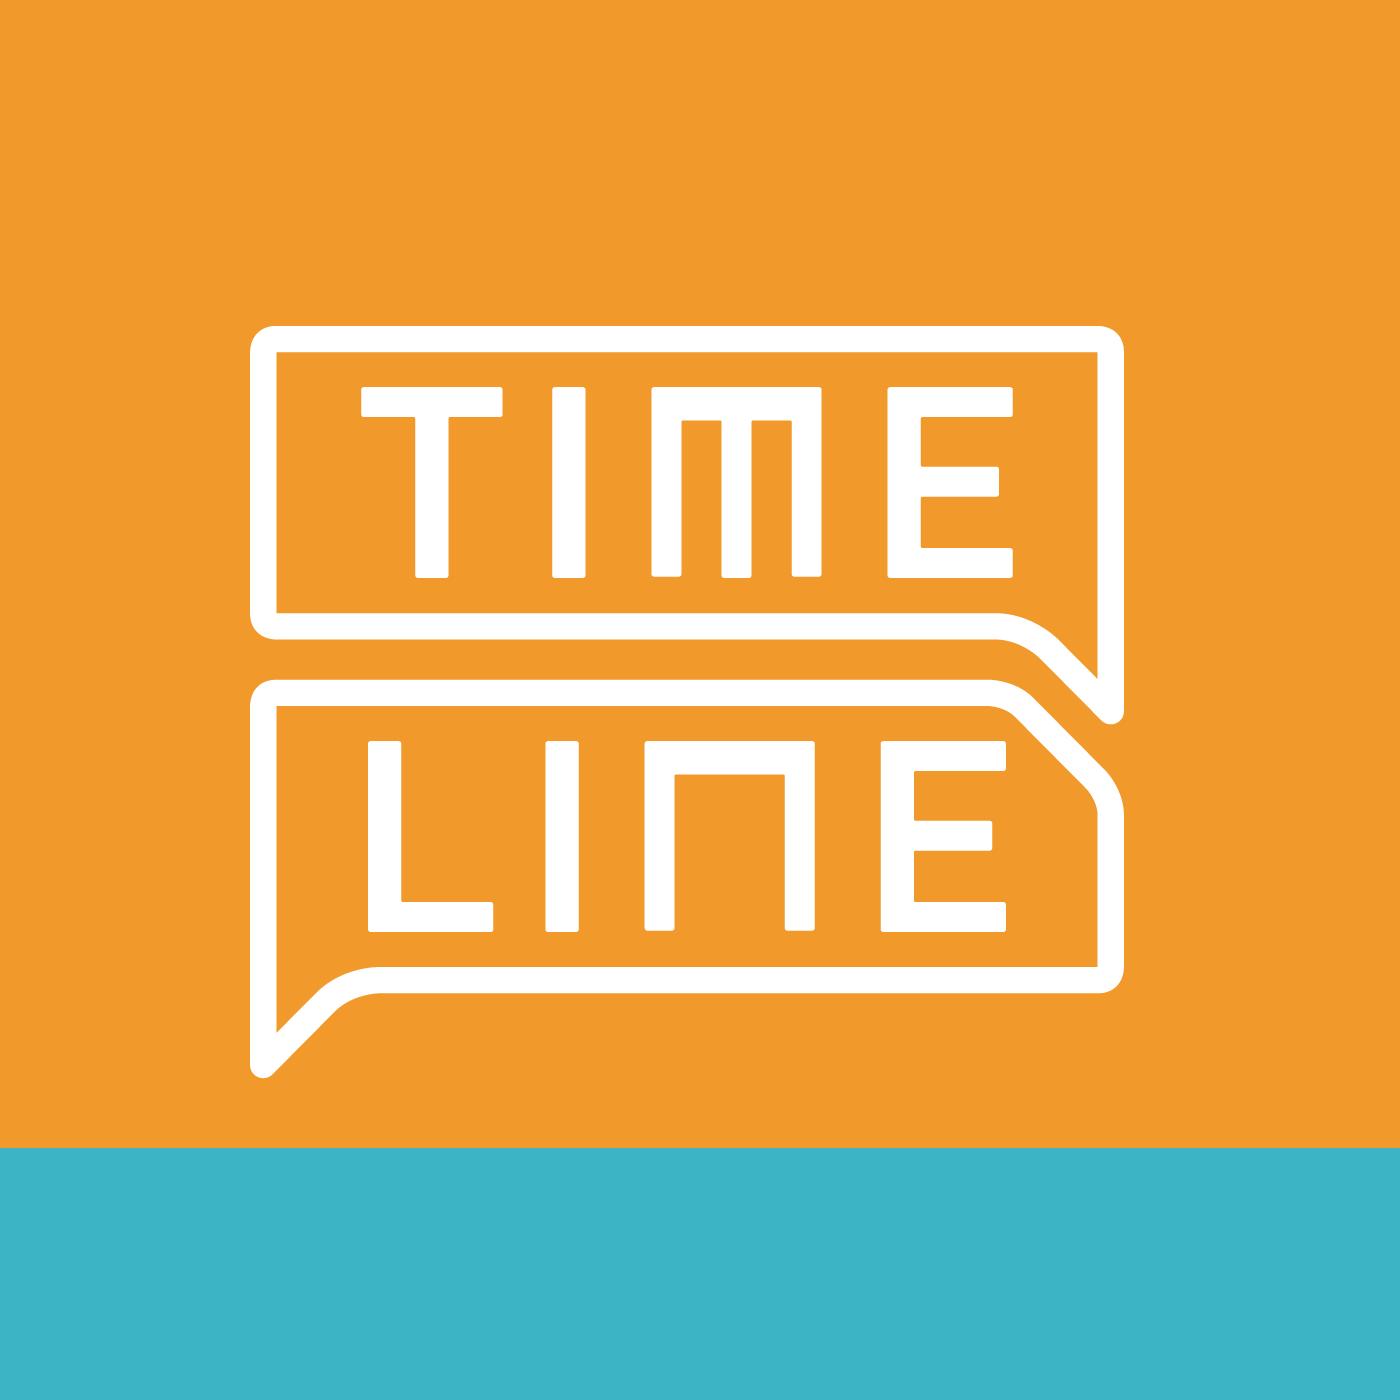 Timeline Gaúcha 22/09/2017